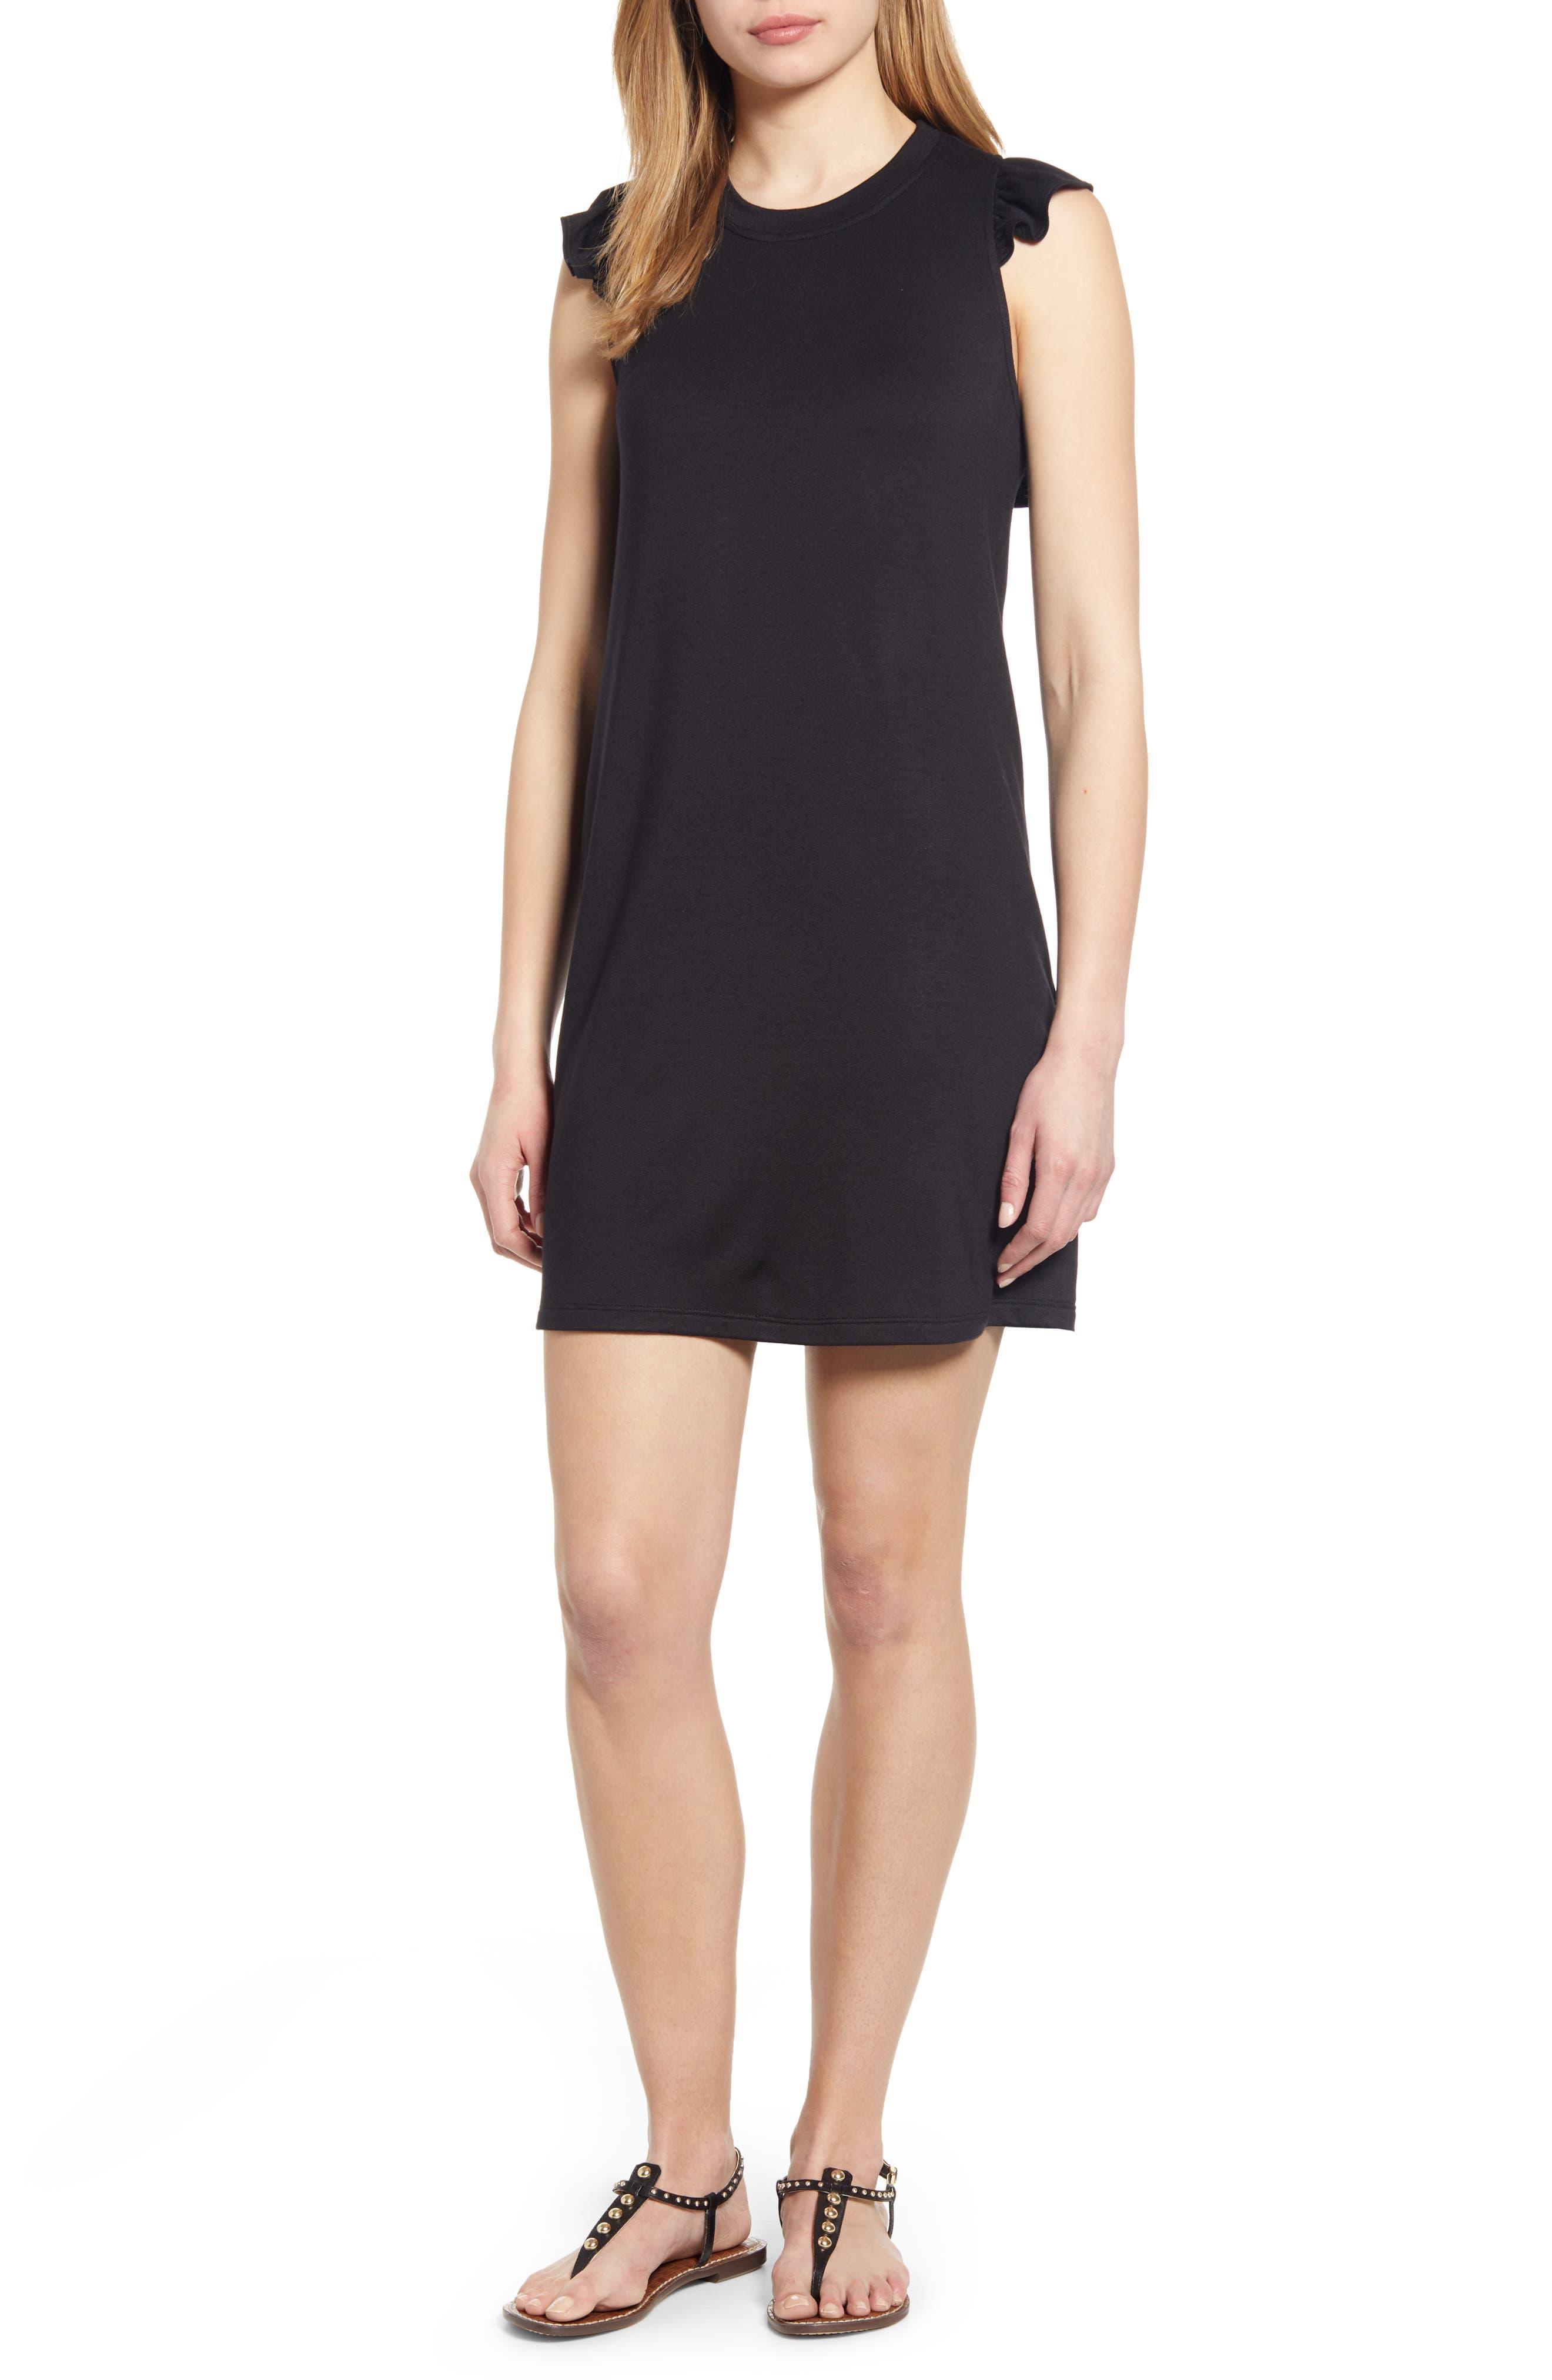 GIBSON, x Hi Sugarplum! Laguna Soft Jersey Ruffle Back T-Shirt Dress, Main thumbnail 1, color, BLACK